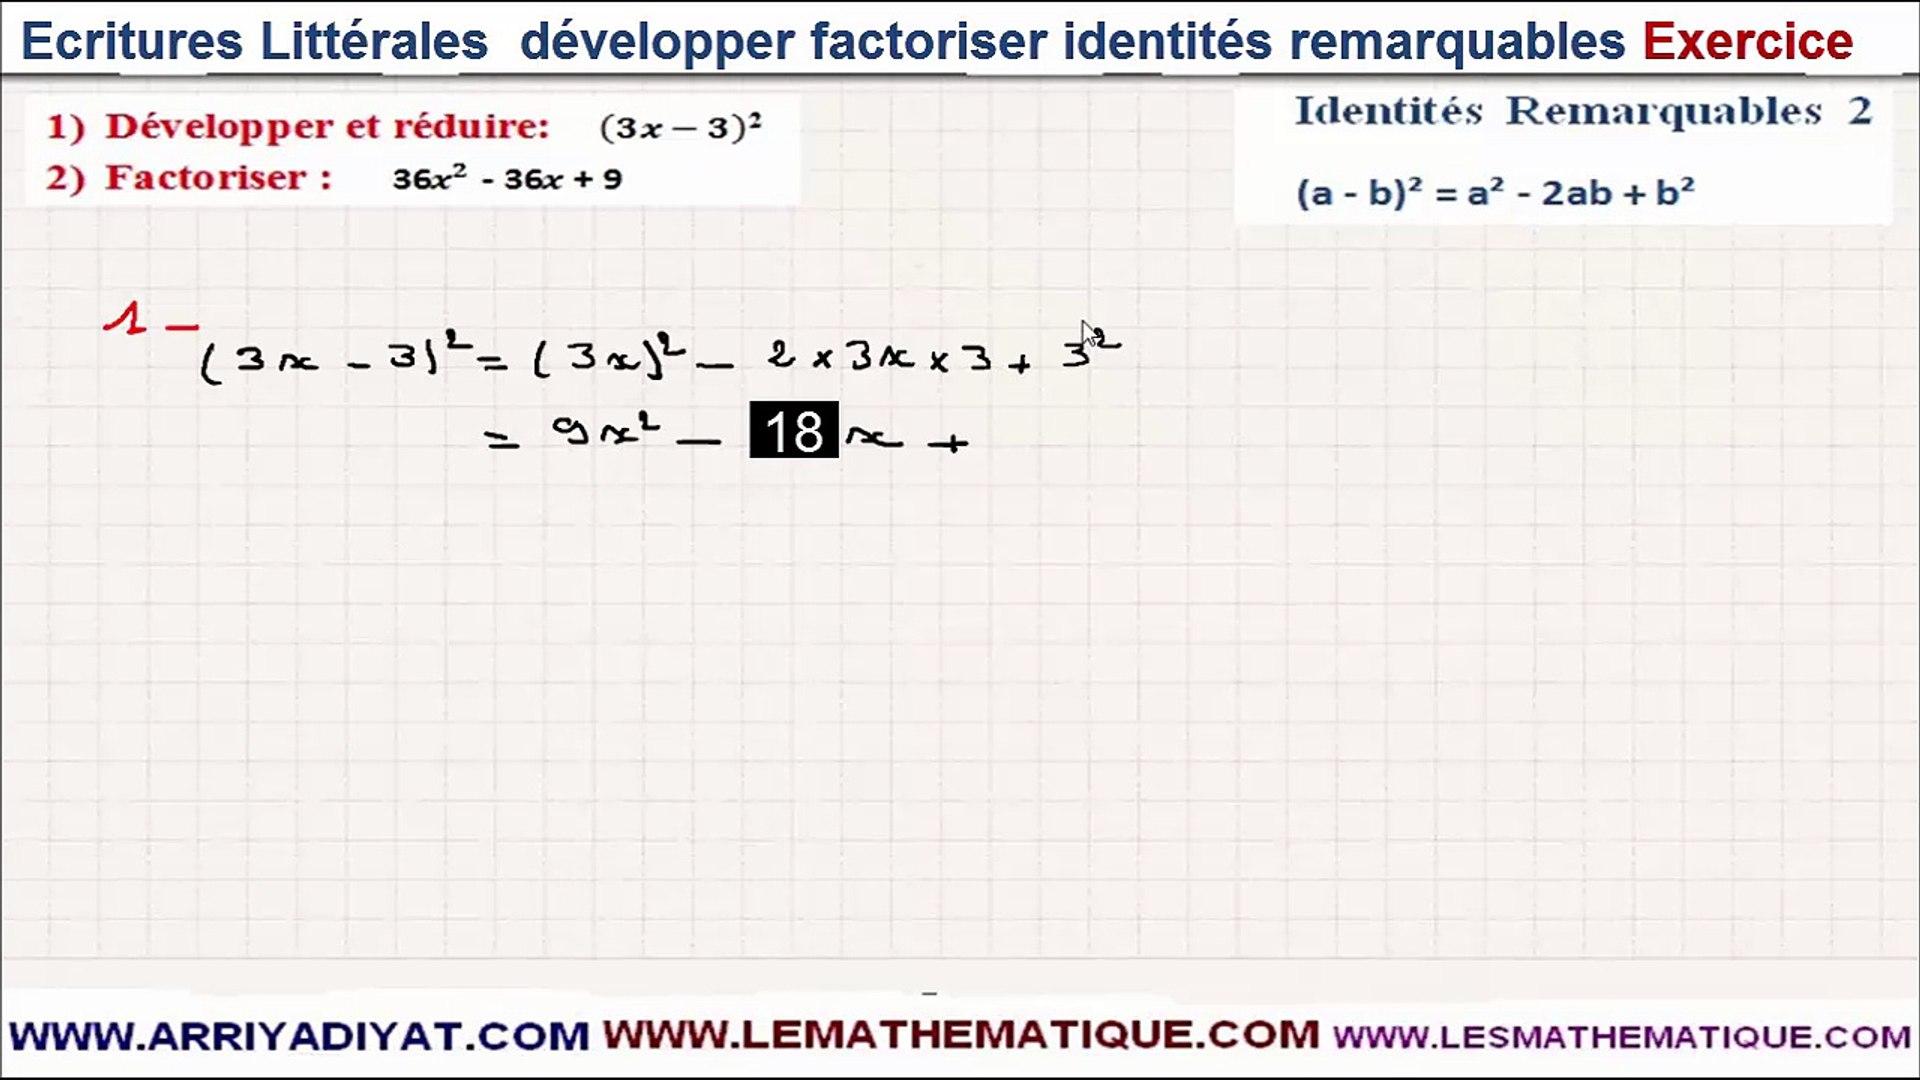 Maths 3eme Ecritures Litterales Developper Factoriser Identites Remarquables Exercice 2 Video Dailymotion